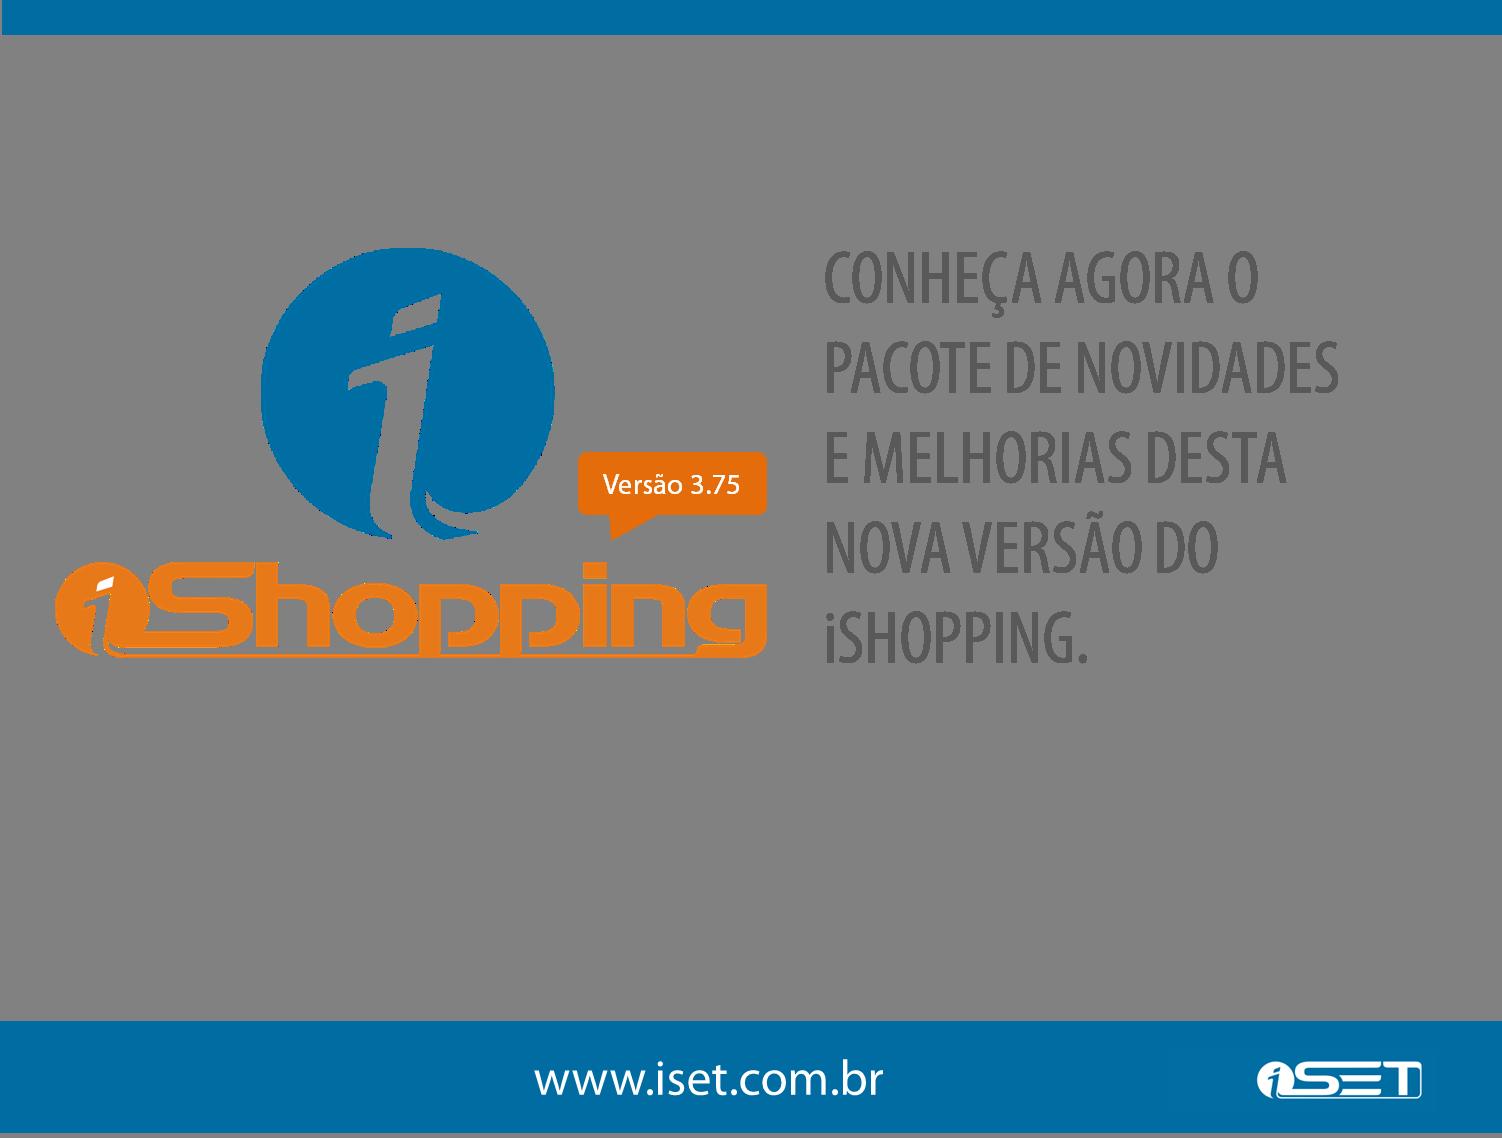 Novidades iShopping: versão 3.75